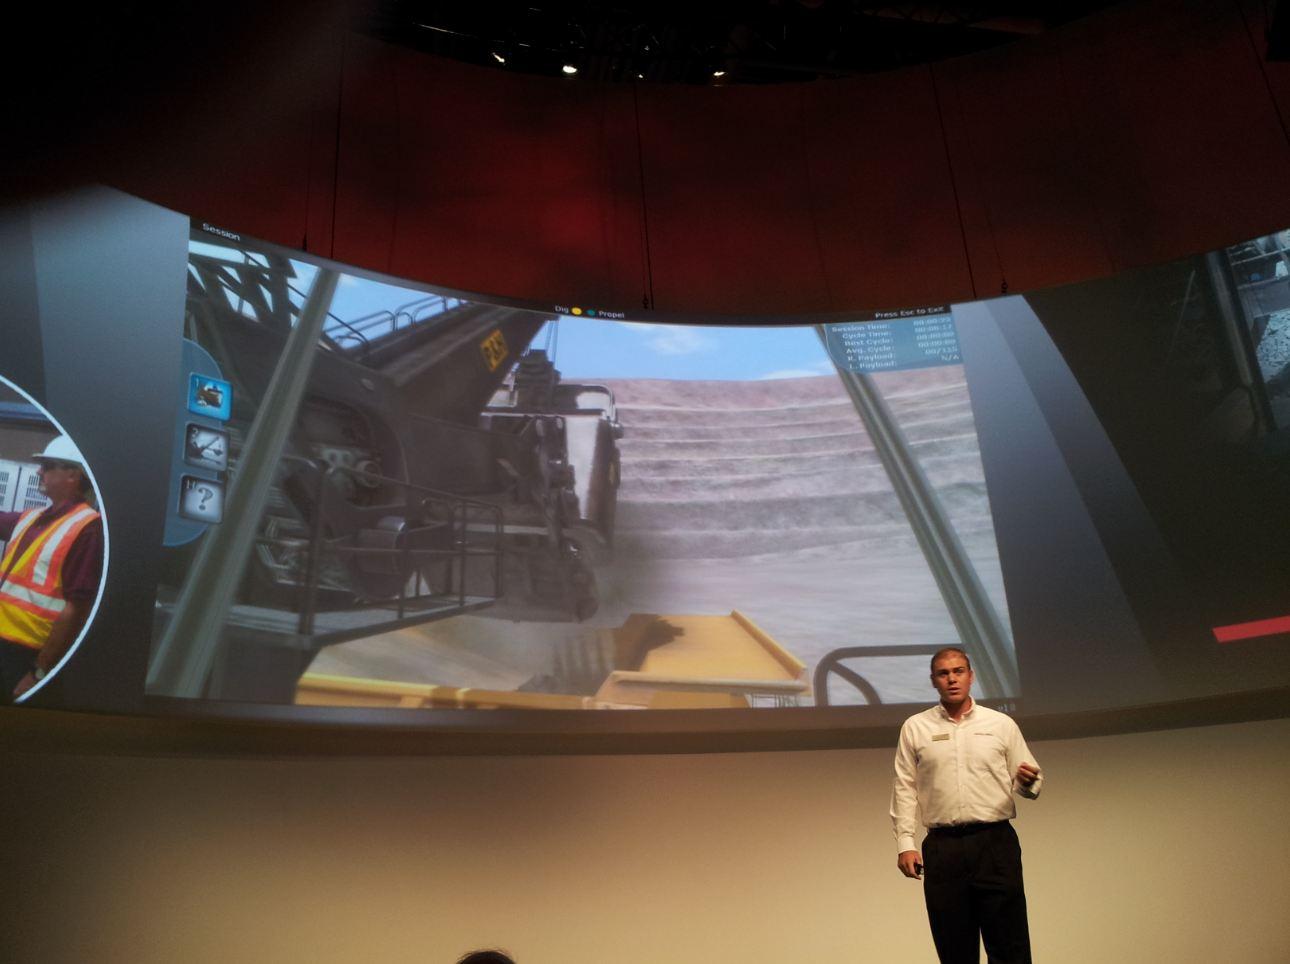 Komatsu P&H Mining Electric Rope Shovel Training Simulator at MINExpo